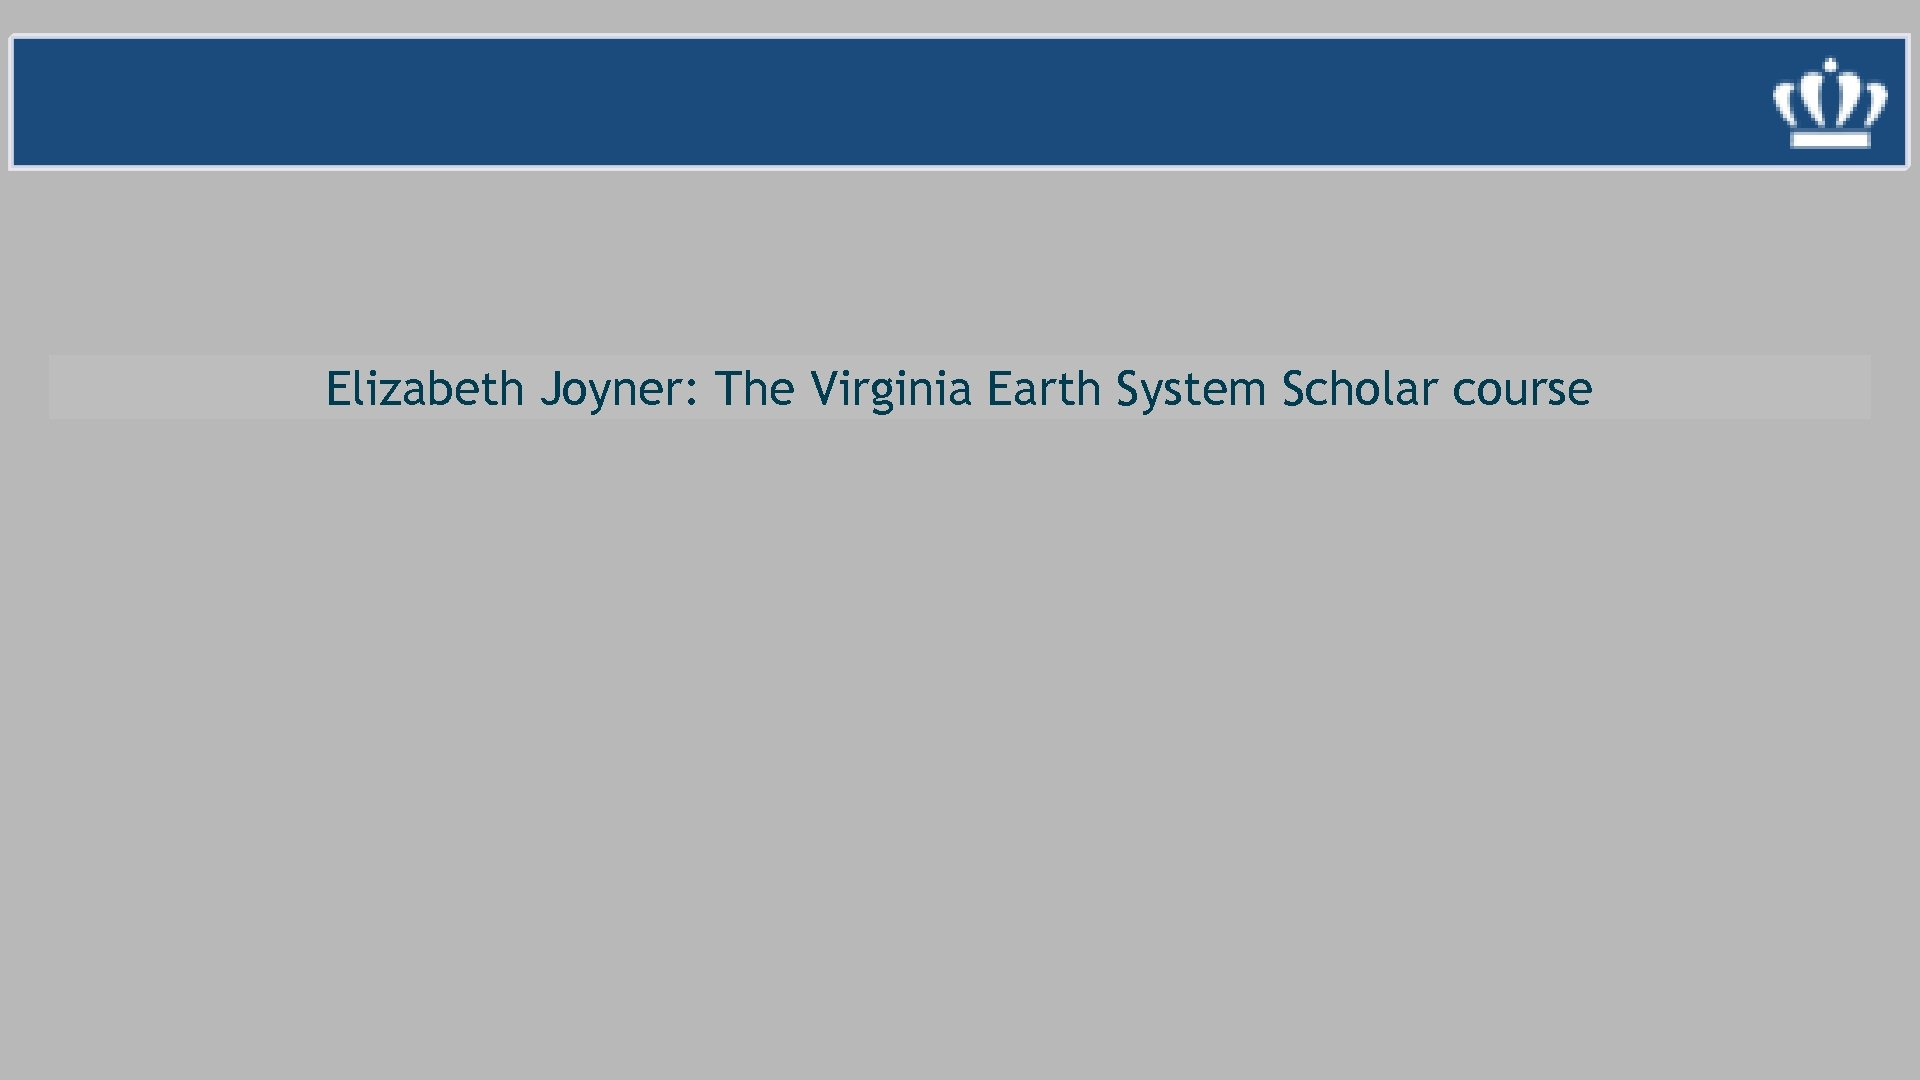 Elizabeth Joyner: The Virginia Earth System Scholar course